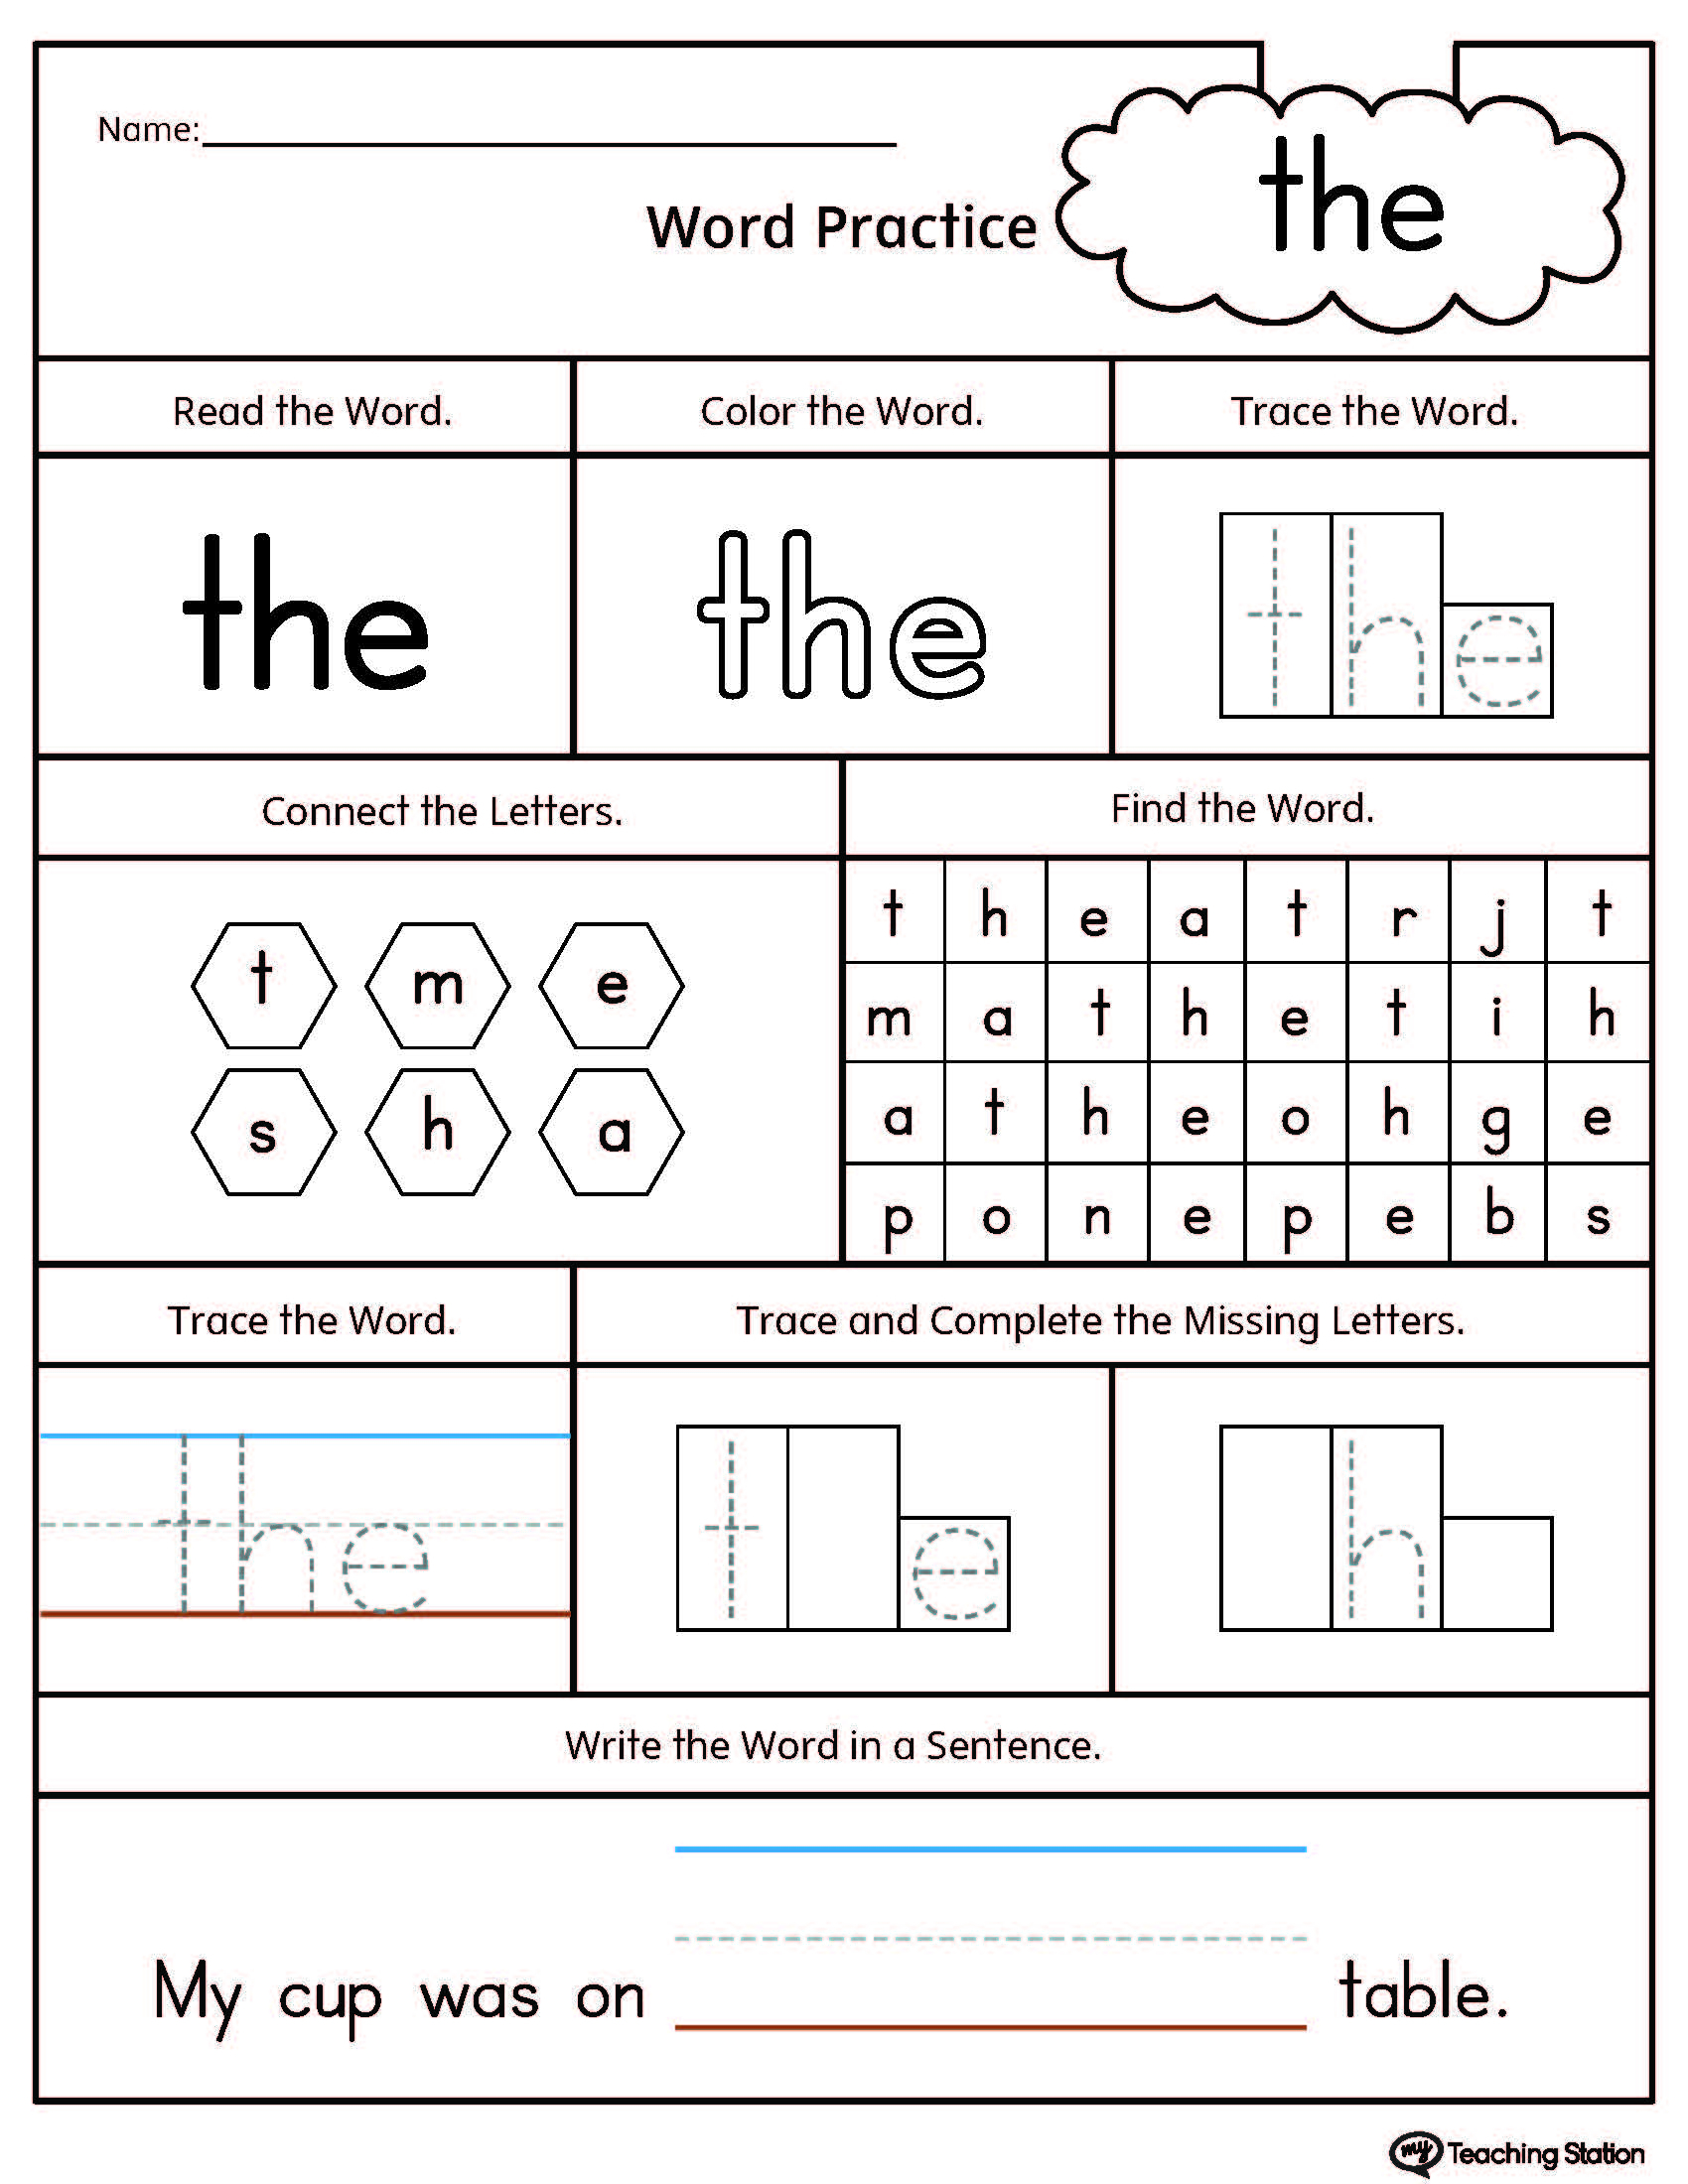 Sight Word The Printable Worksheet | Myteachingstation | Printable Sight Word Worksheets